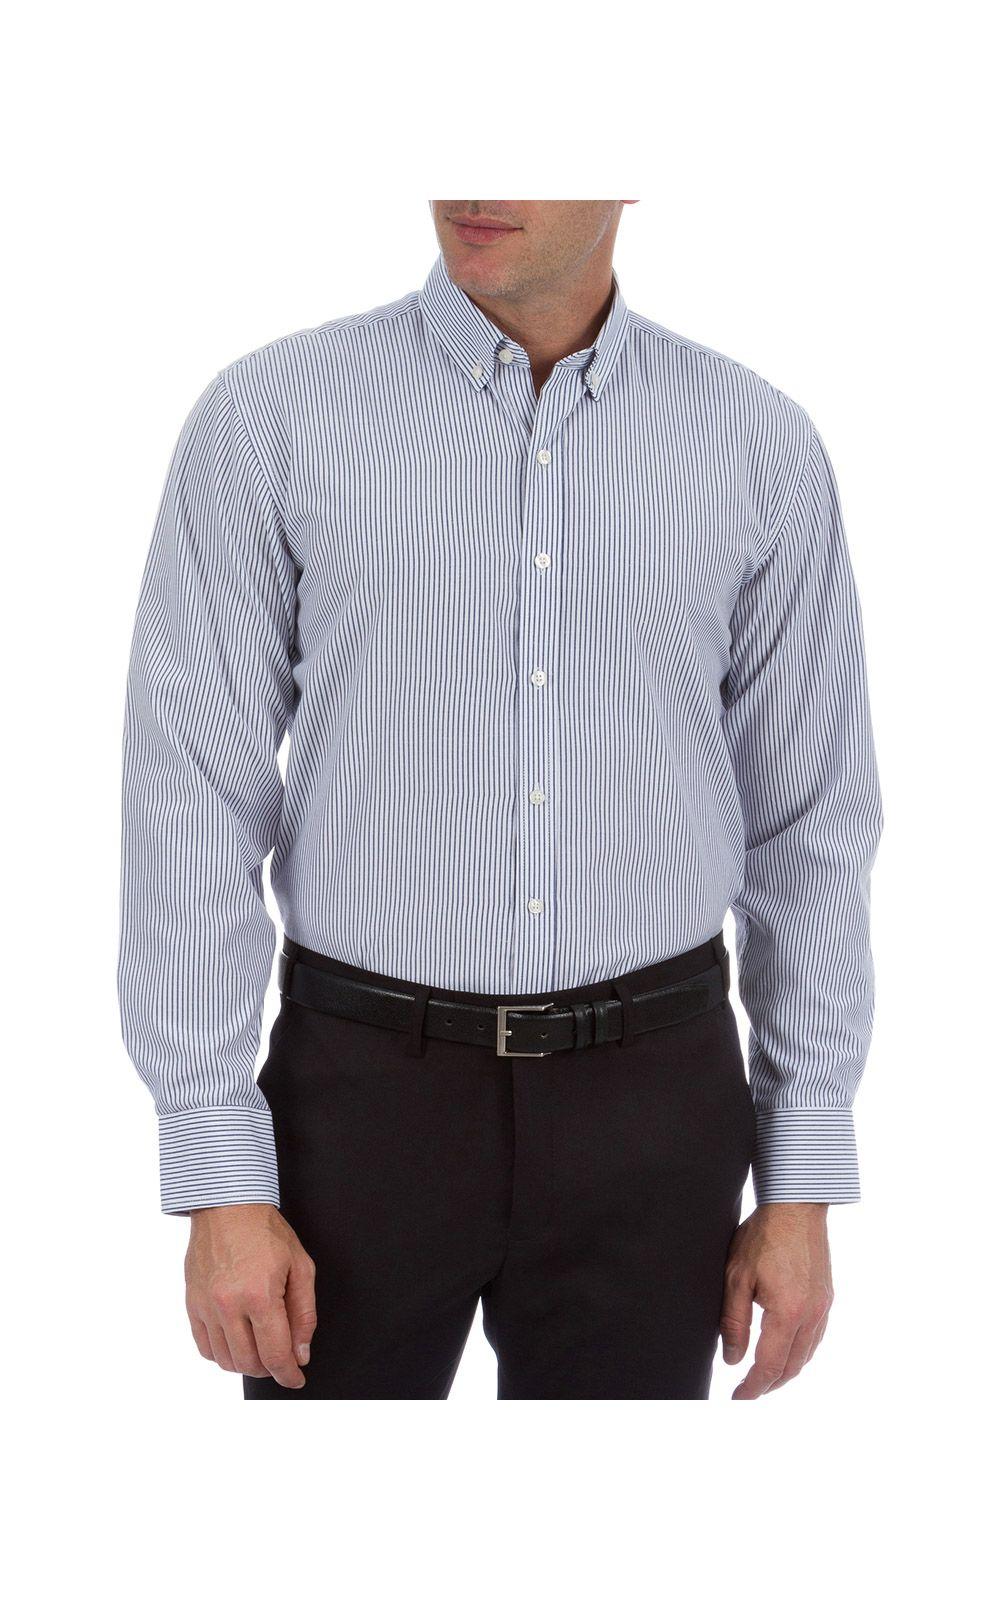 Foto 5 - Camisa Social Masculina Azul Listrada